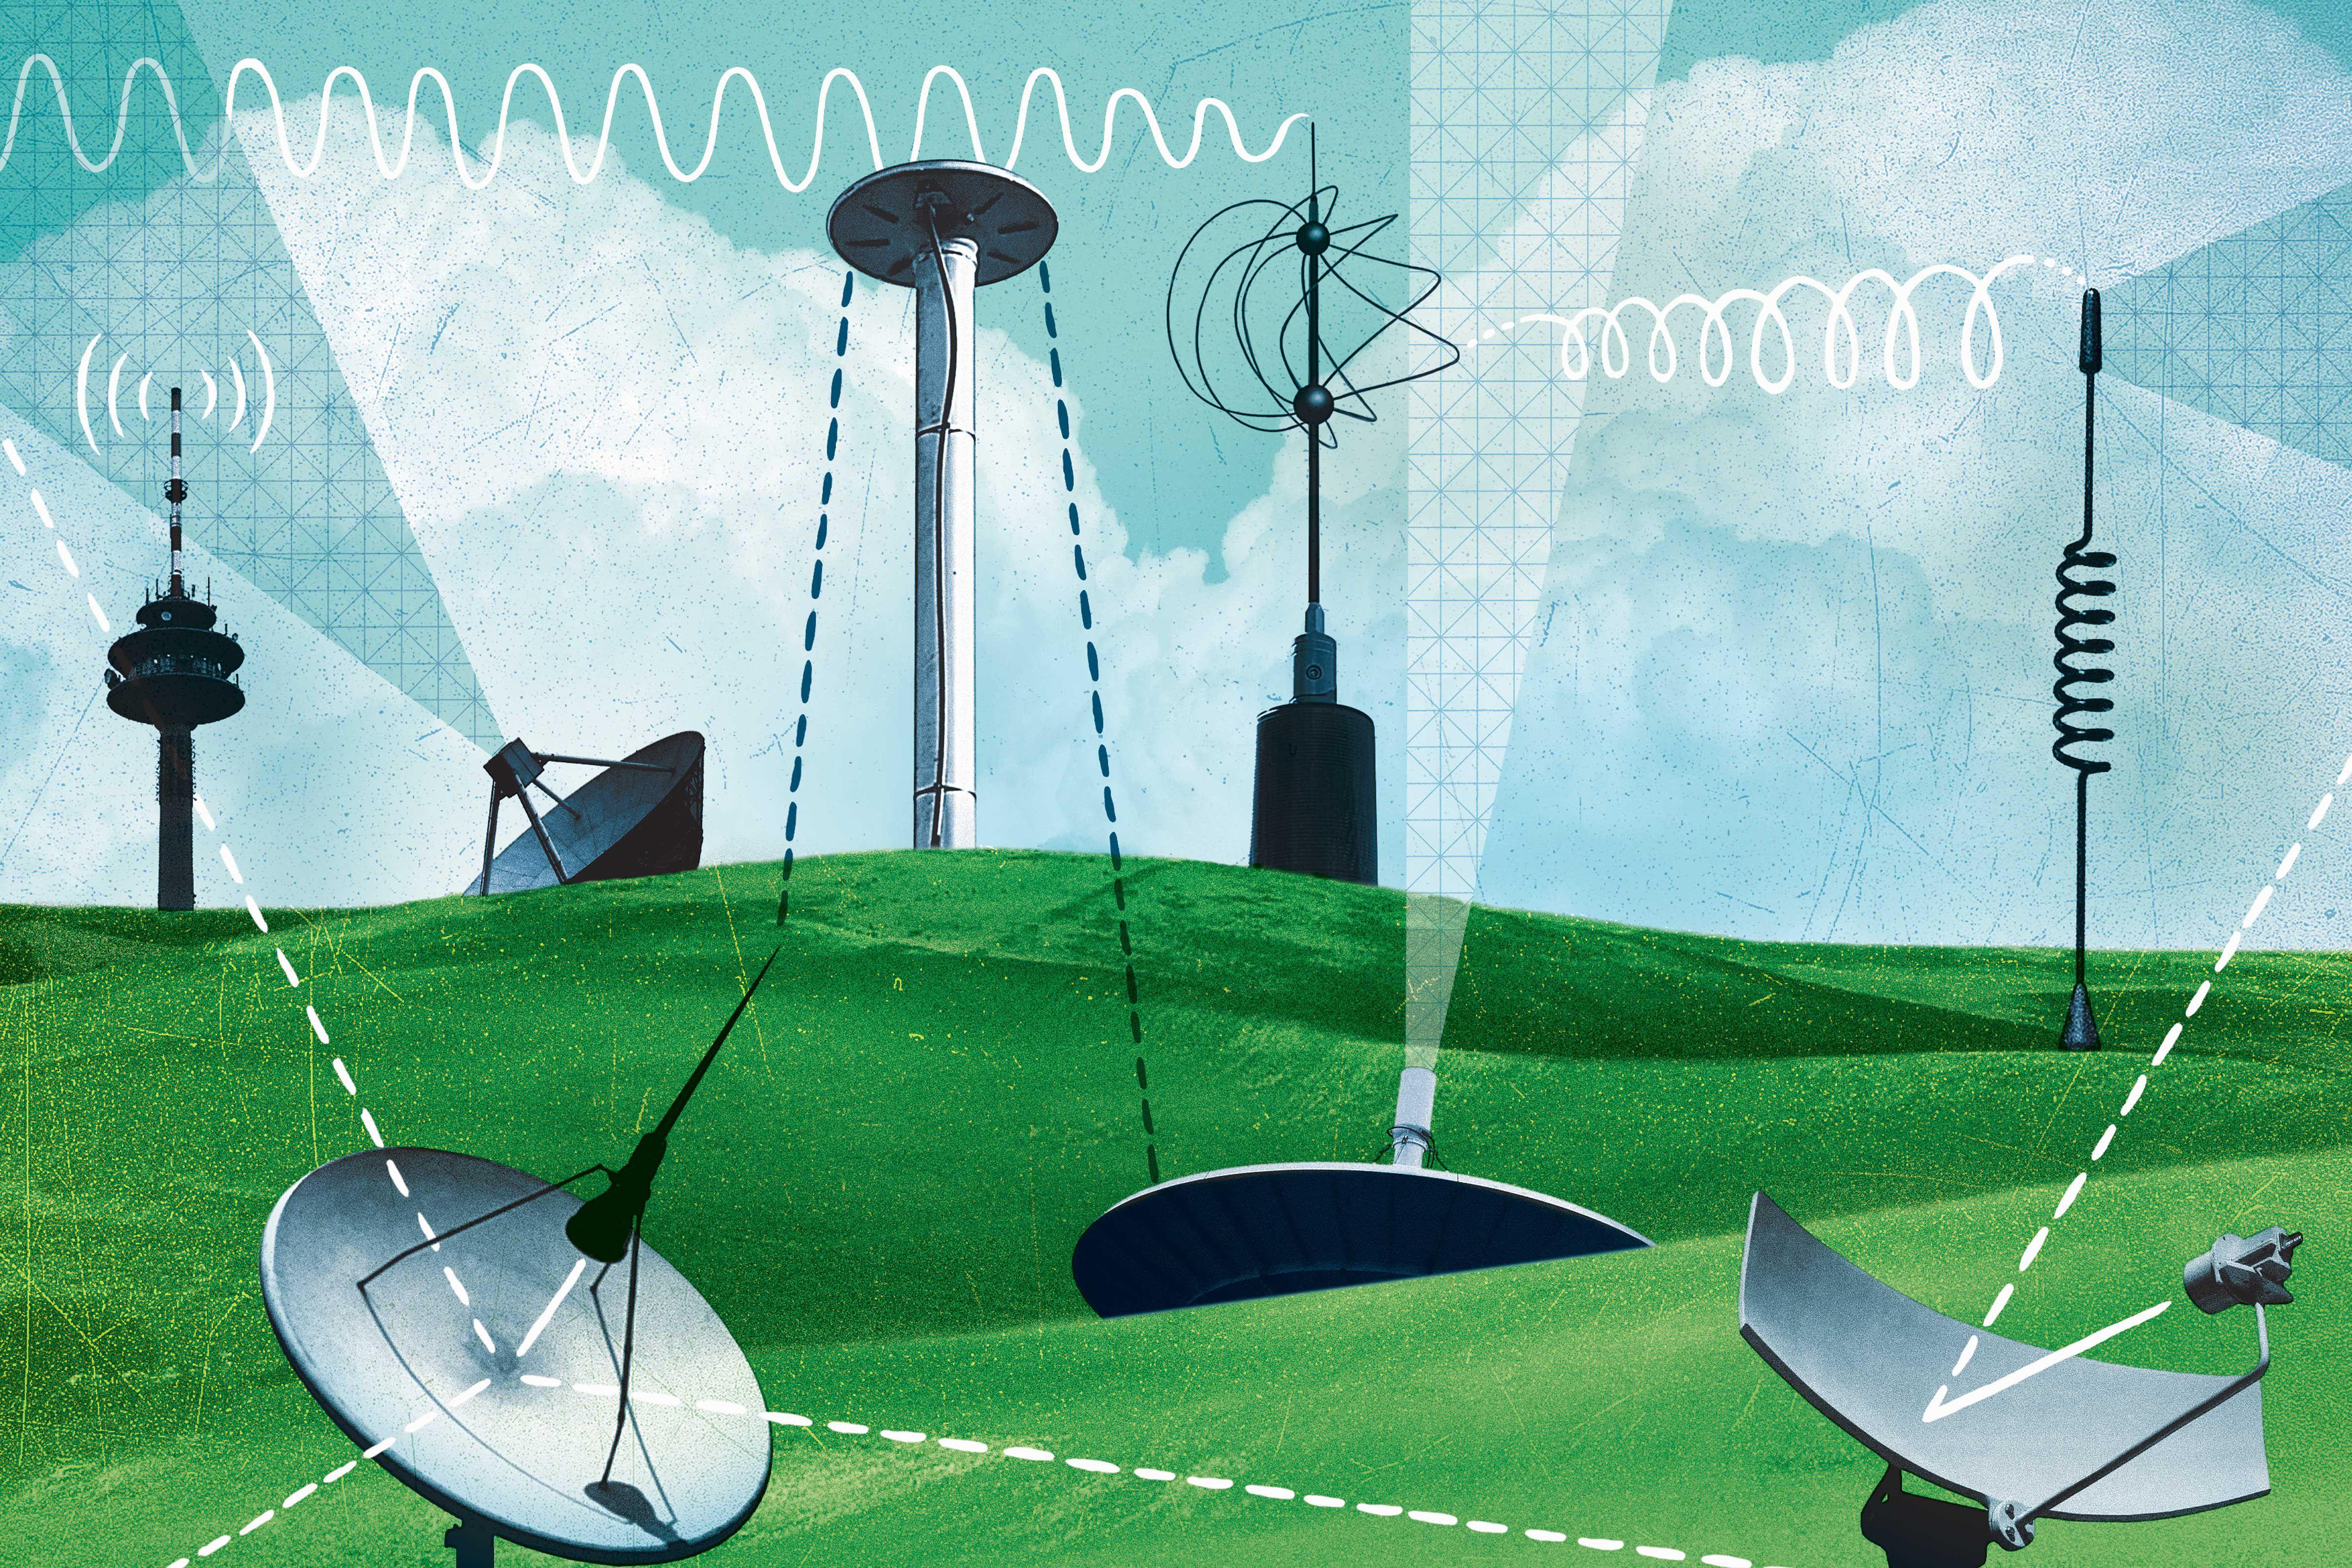 Antennas and satellite dishes